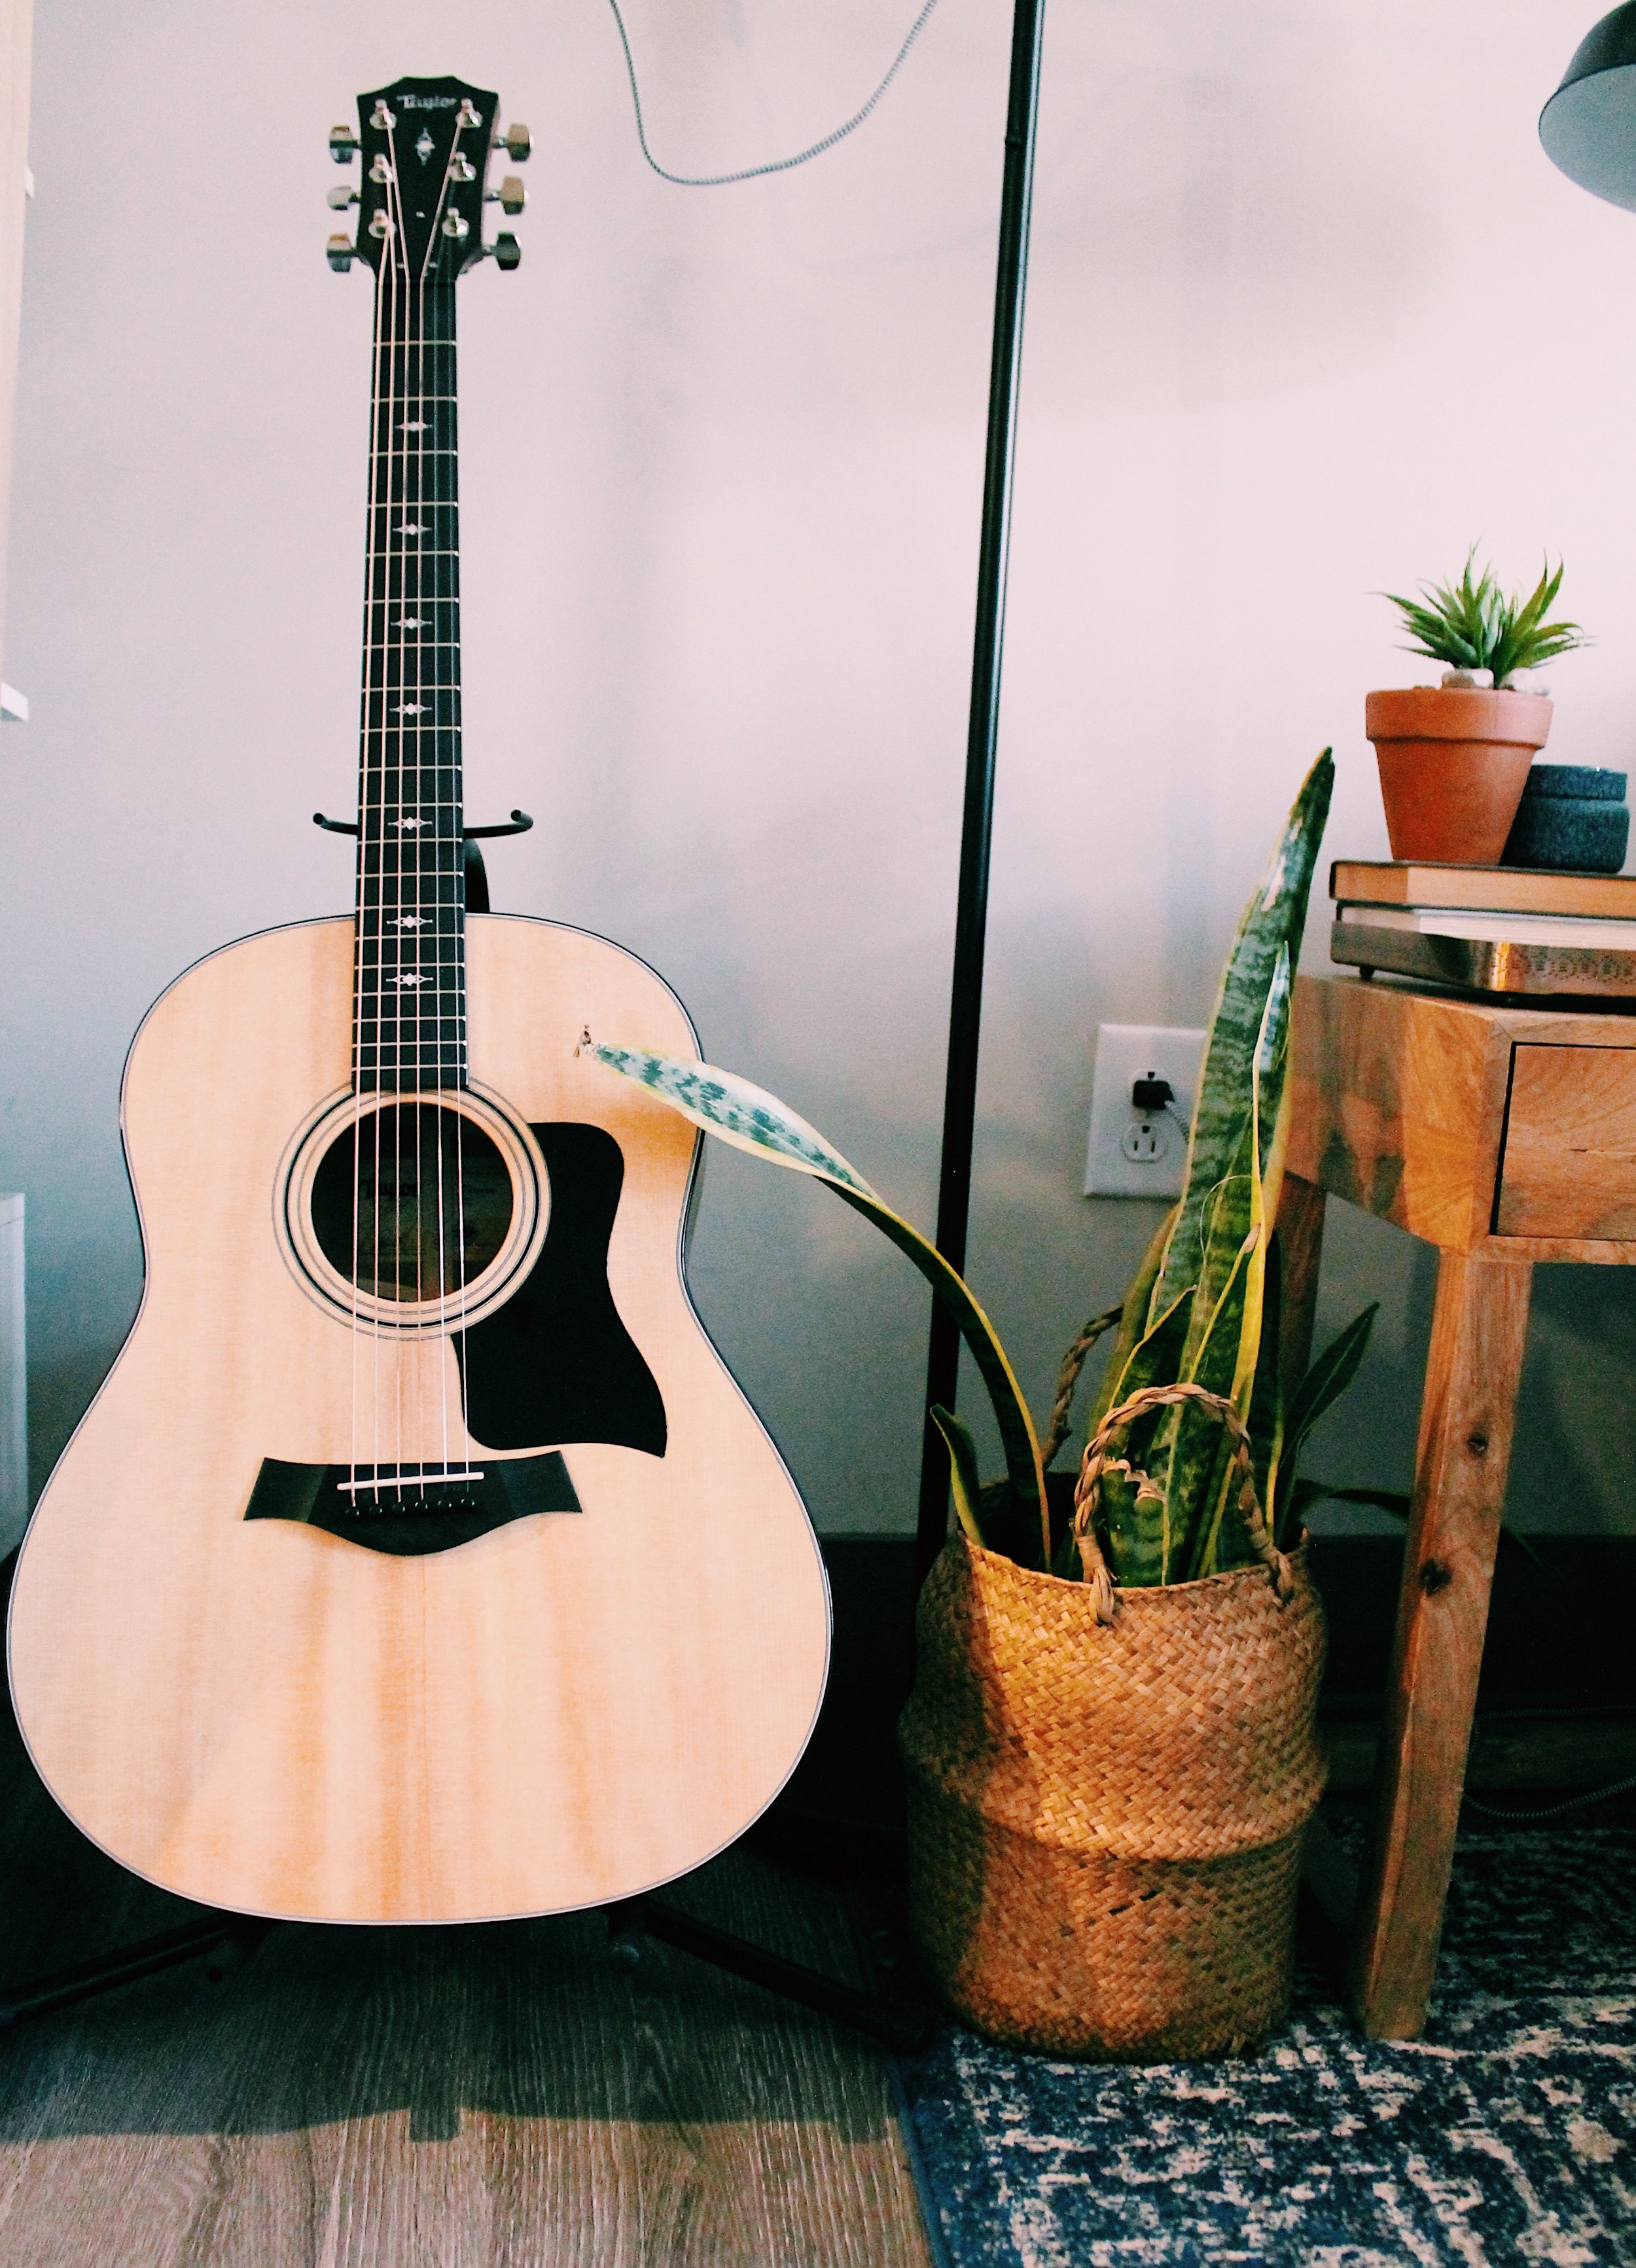 How to Improve your Rhythm on Guitar blog